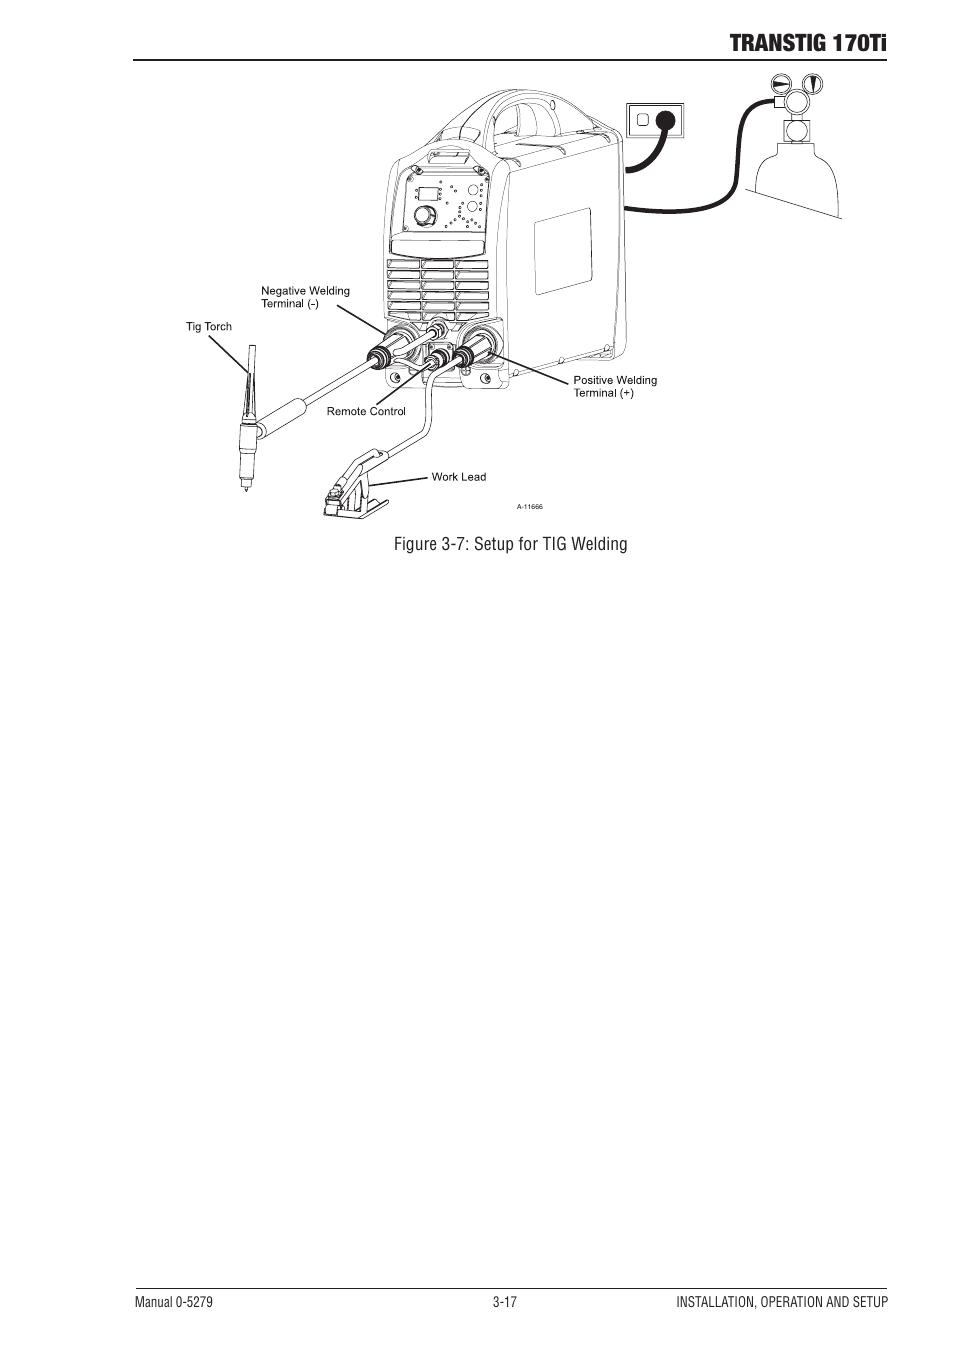 Transtig 170ti Tweco User Manual Page 35 72 Tig Welding Torch Diagram